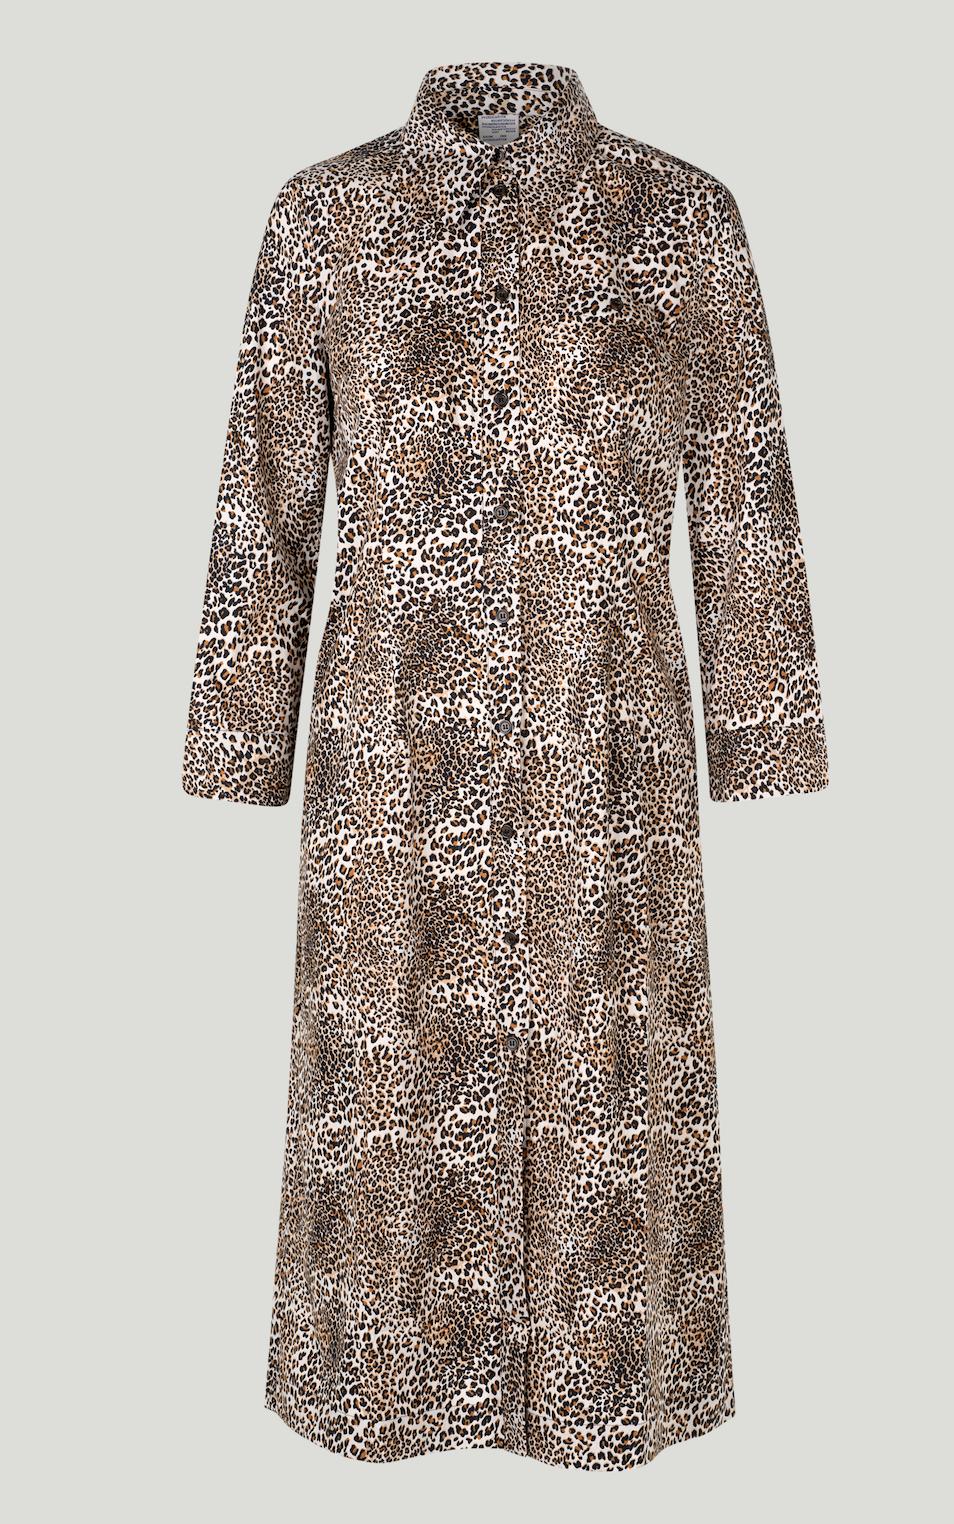 Arlene dress-1